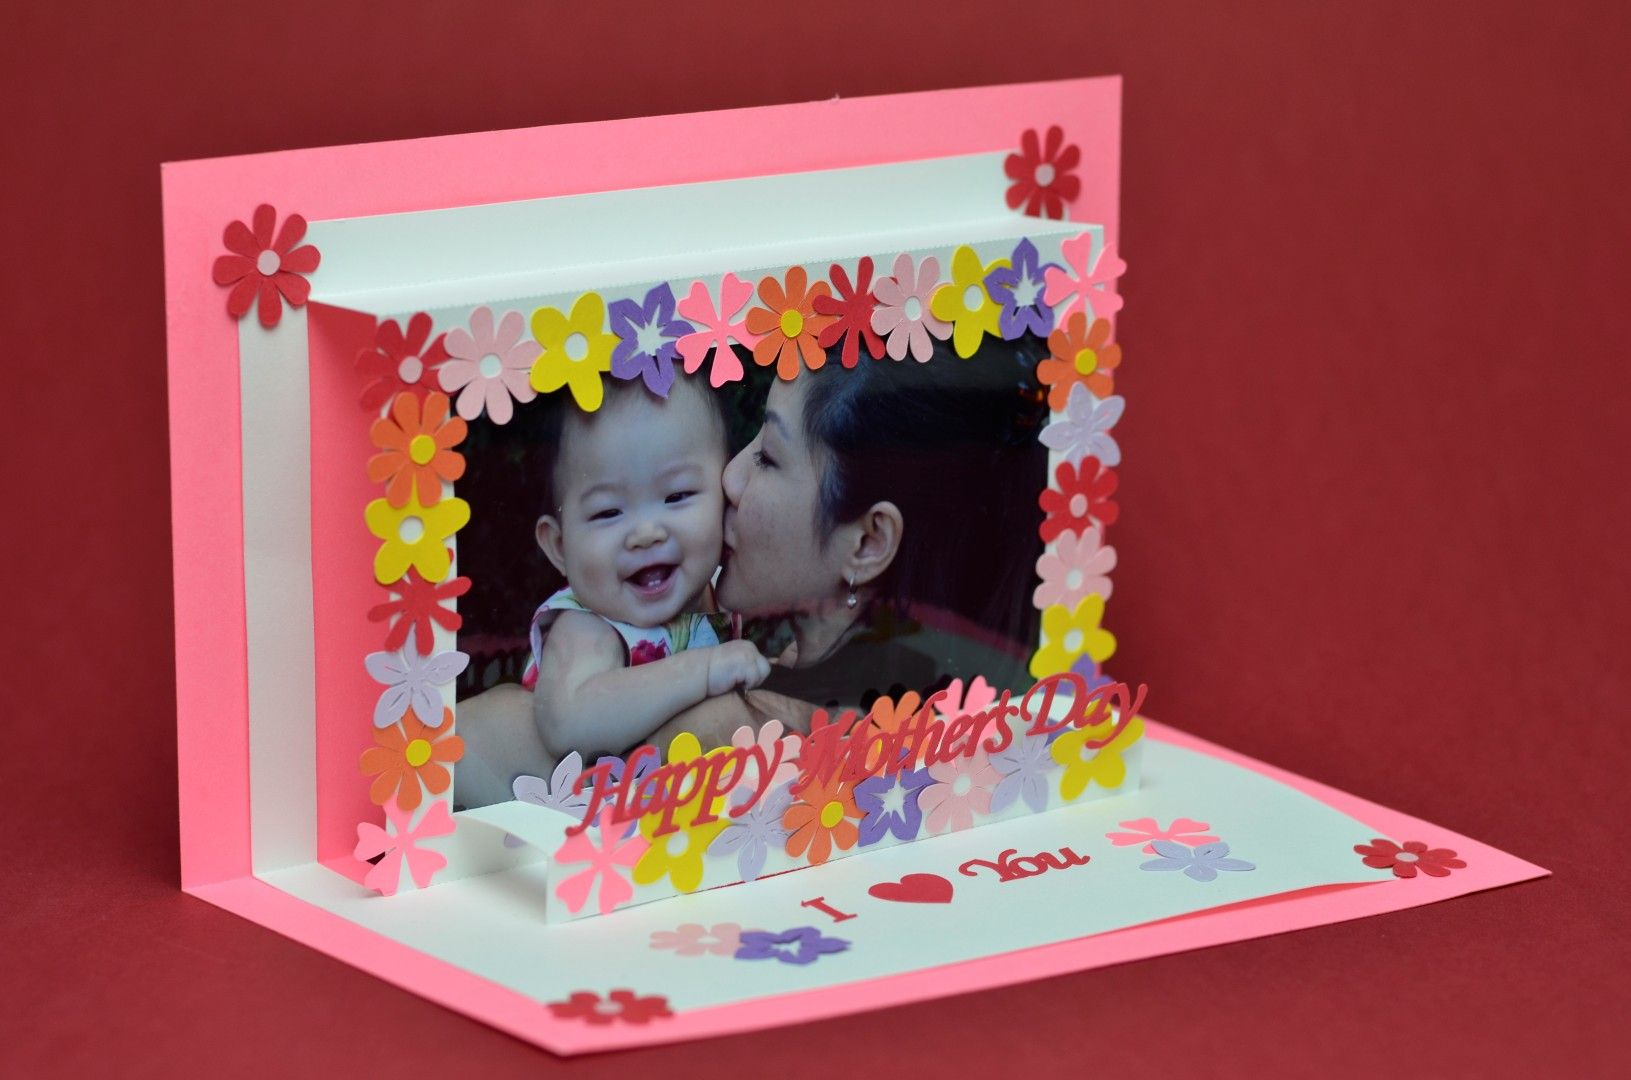 Flower Frame Pop Up Card Template Creative Pop Up Cards Pop Up Card Templates Pop Up Cards Diy Pop Up Cards